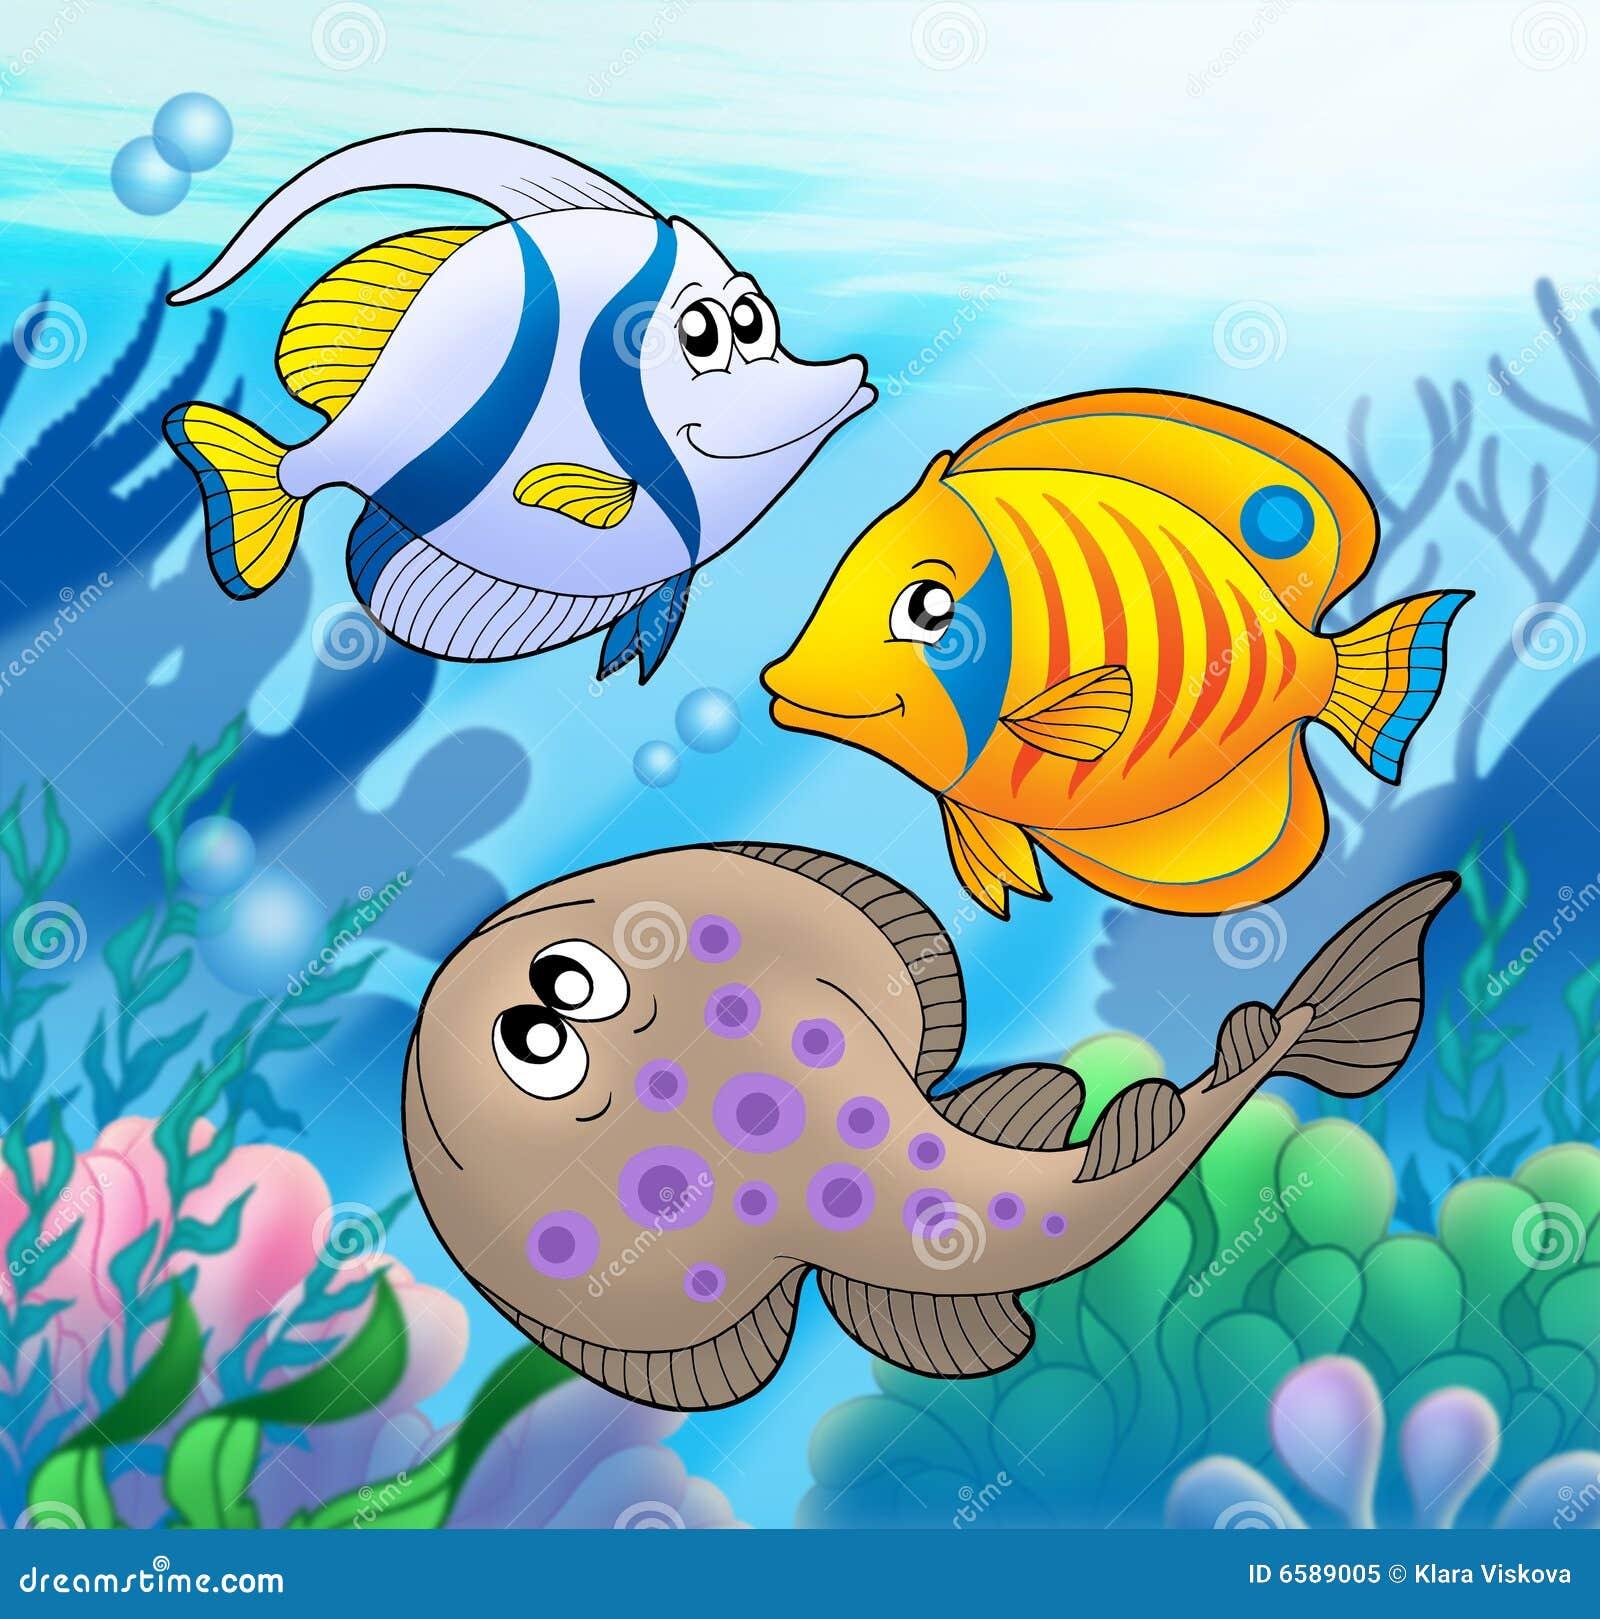 Animais marinhos bonitos 2 foto de stock royalty free for Immagini coralli marini